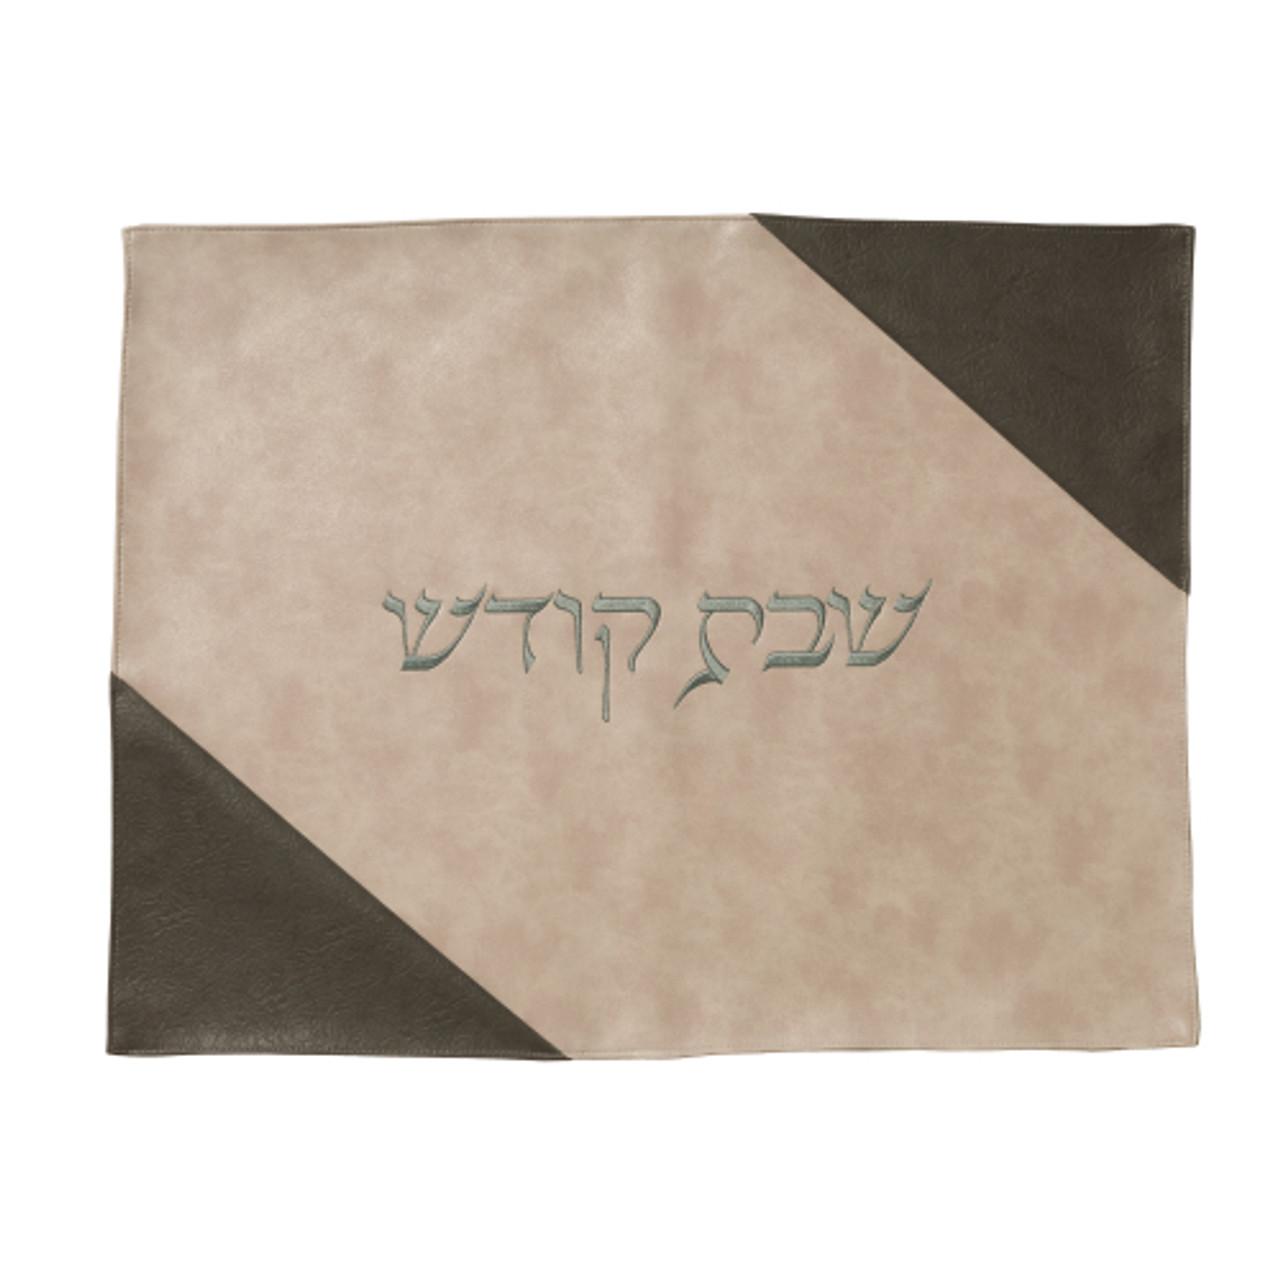 "Faux Leather ""Shabbat Kodesh"" Challah Cover"